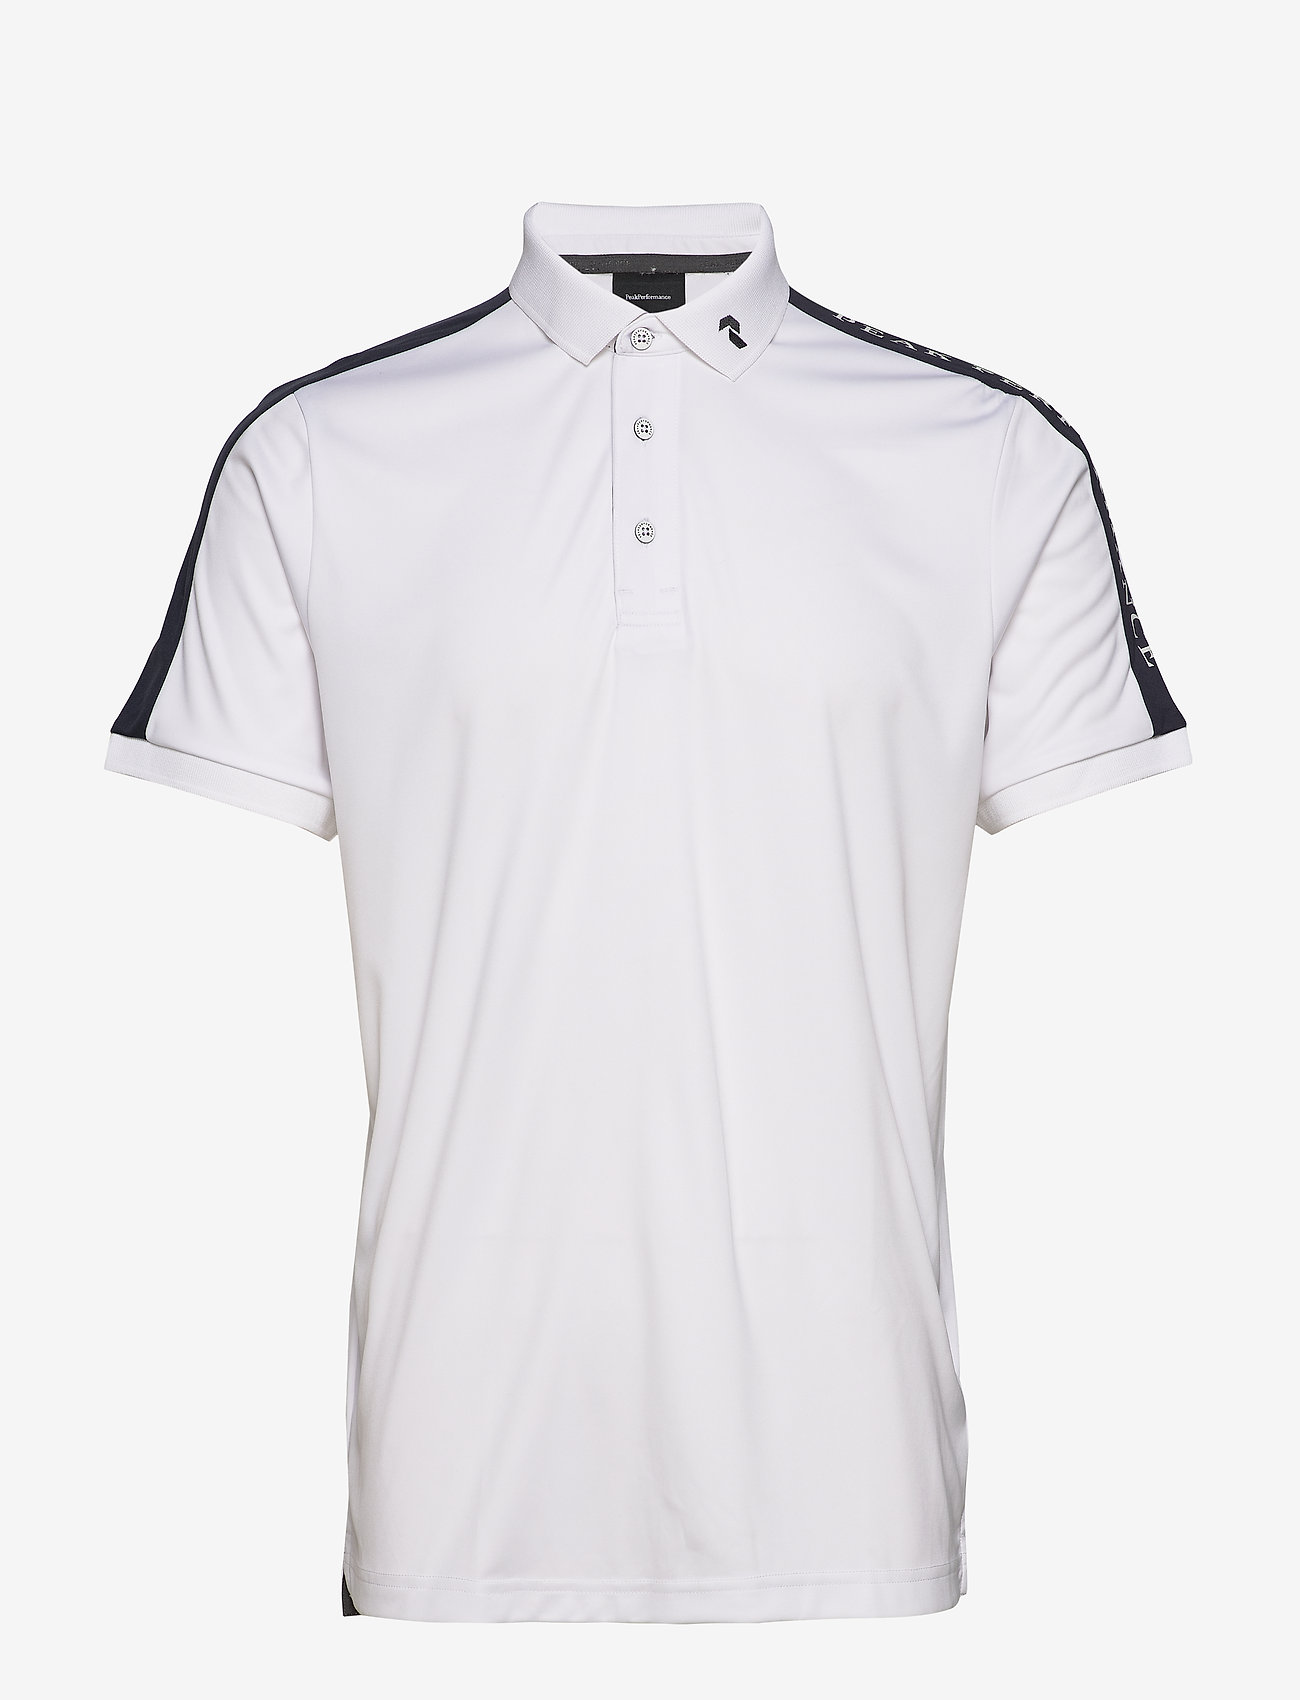 Peak Performance - M Player Polo - white